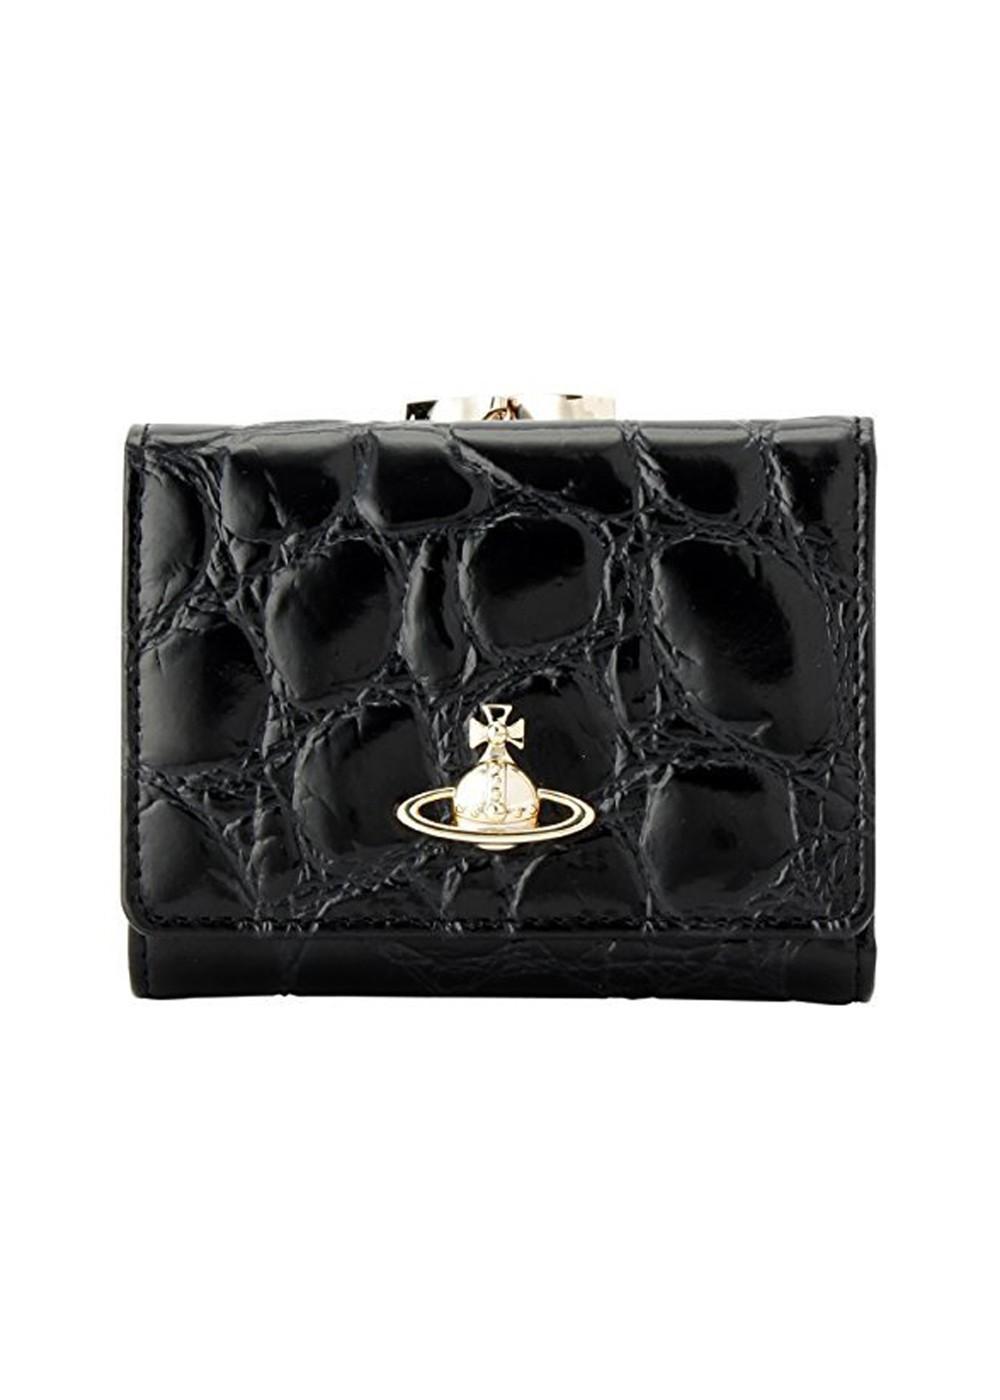 b745101d7f01 ... ヴィヴィアン・ウエストウッド Vivienne Westwood 財布 三つ折り 51010018-40249 BLACK 金具ゴールド ...